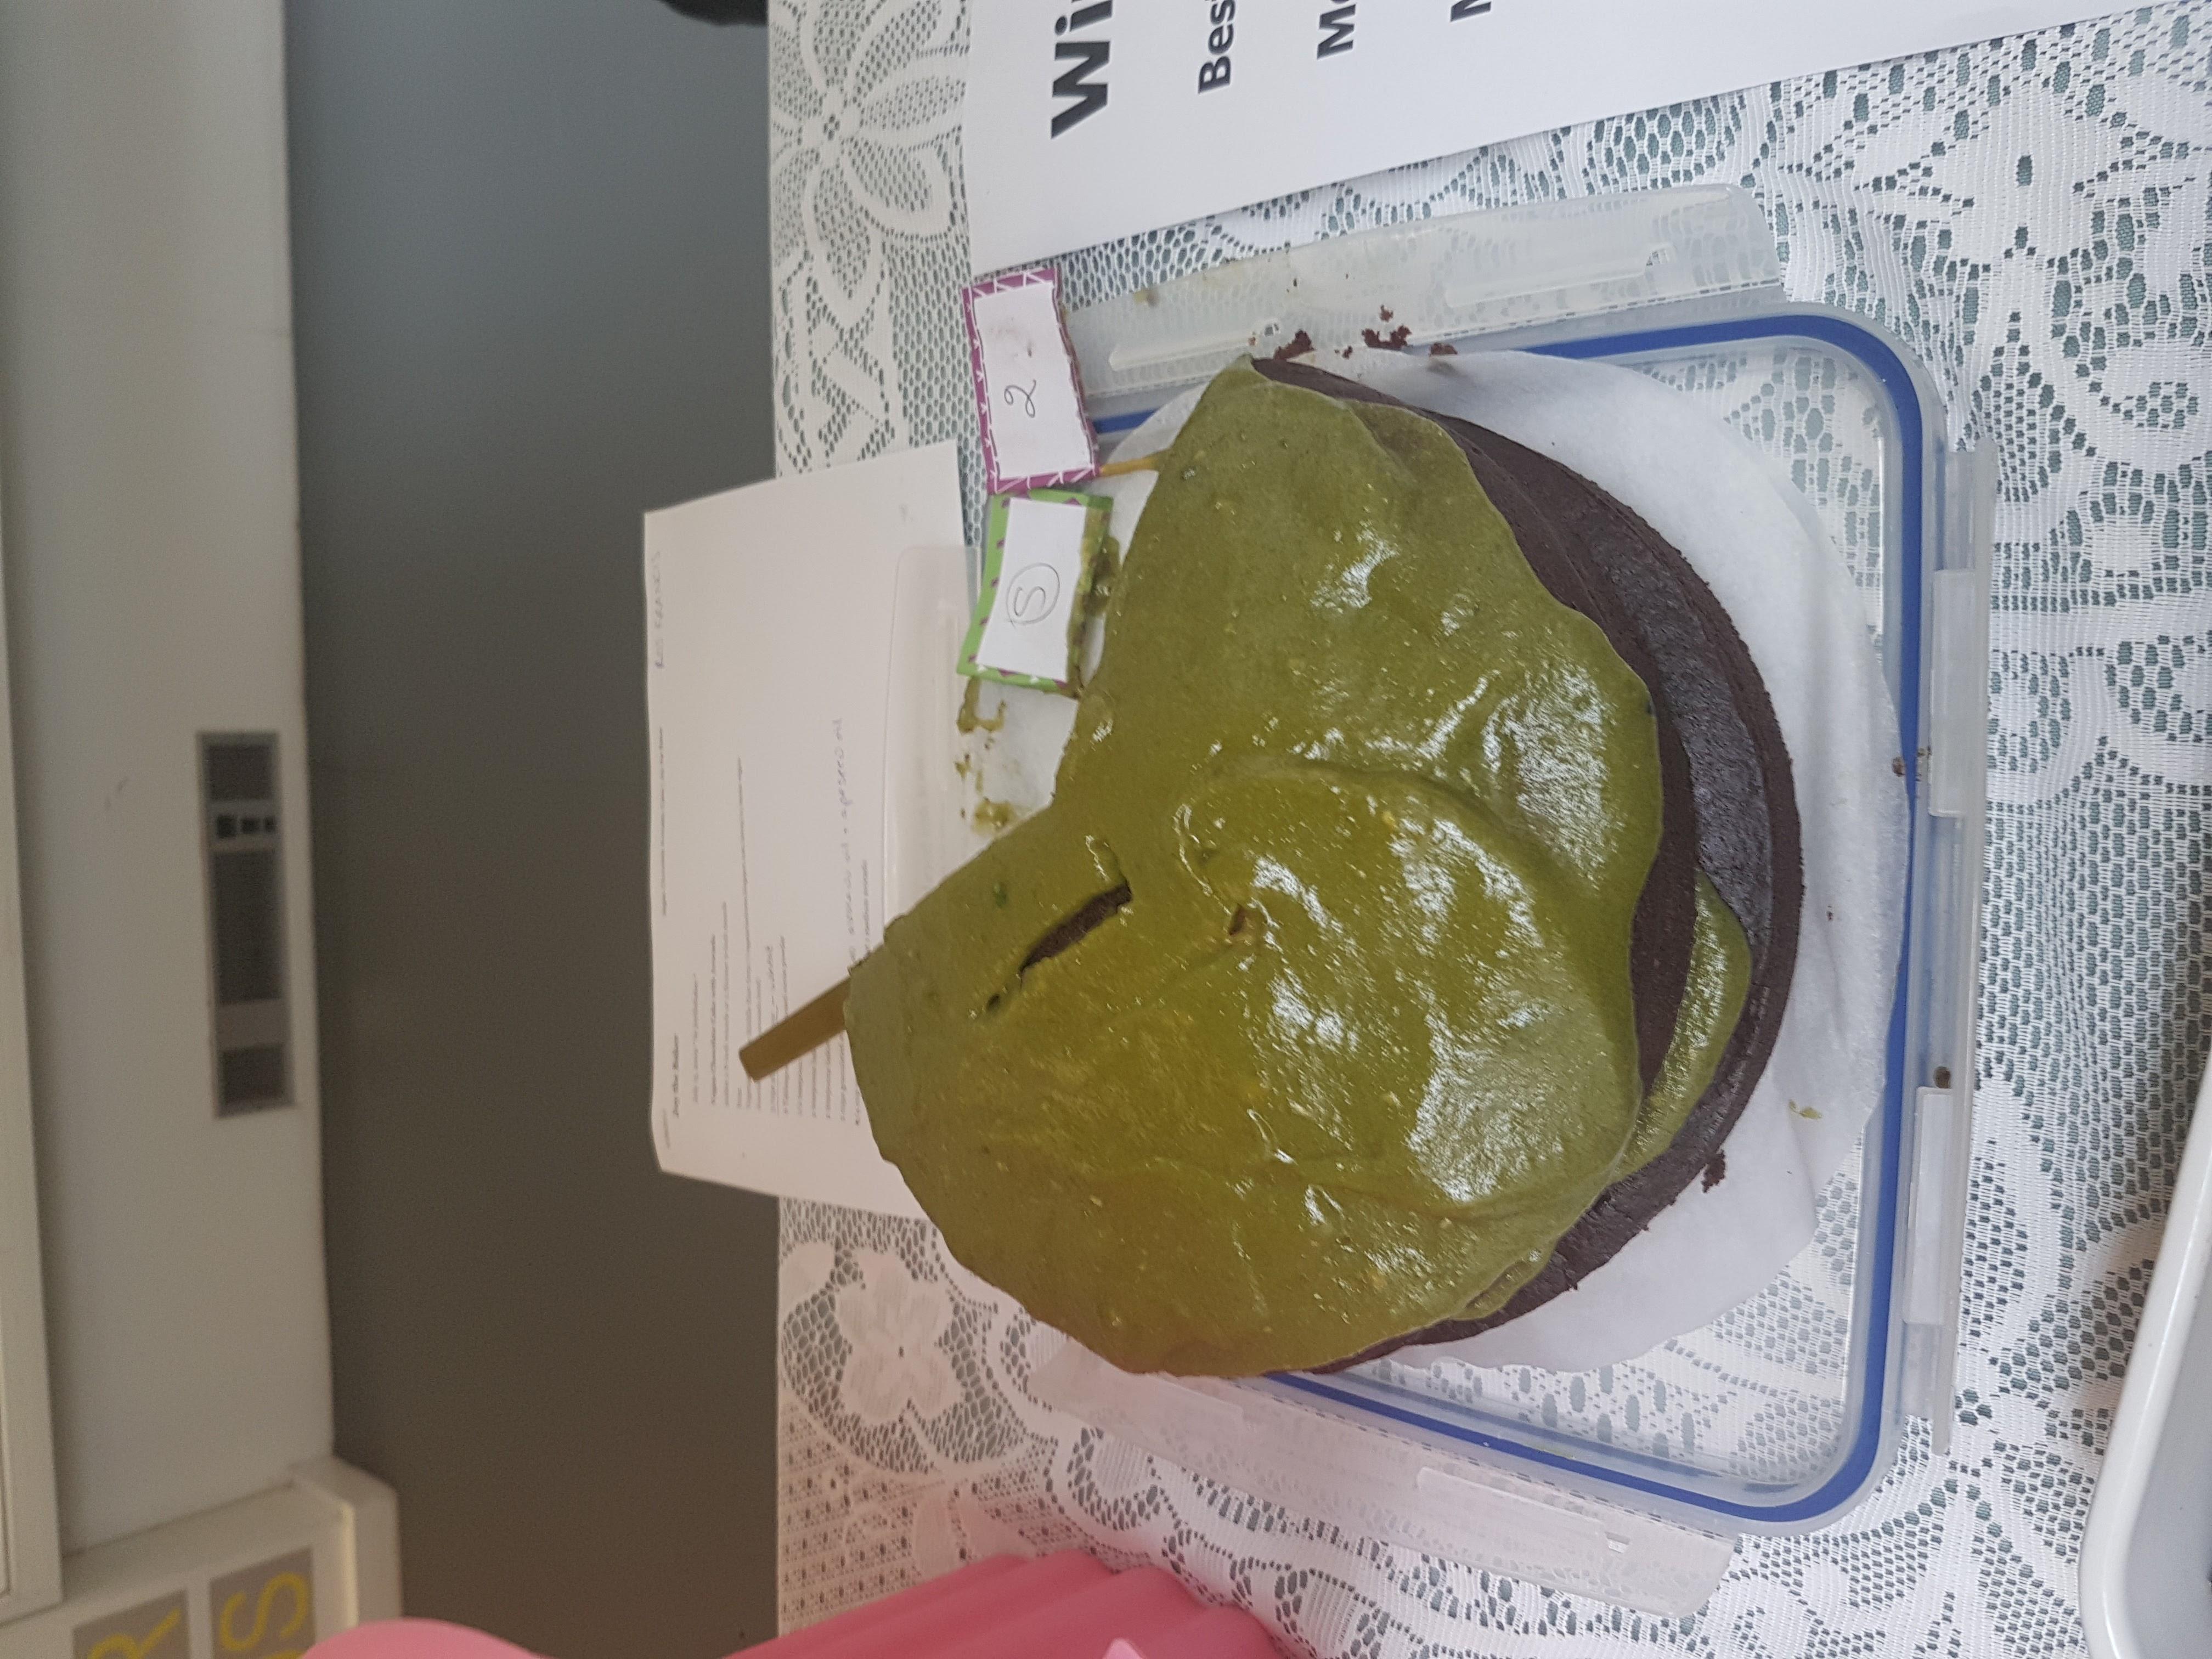 Vegan avocado cake